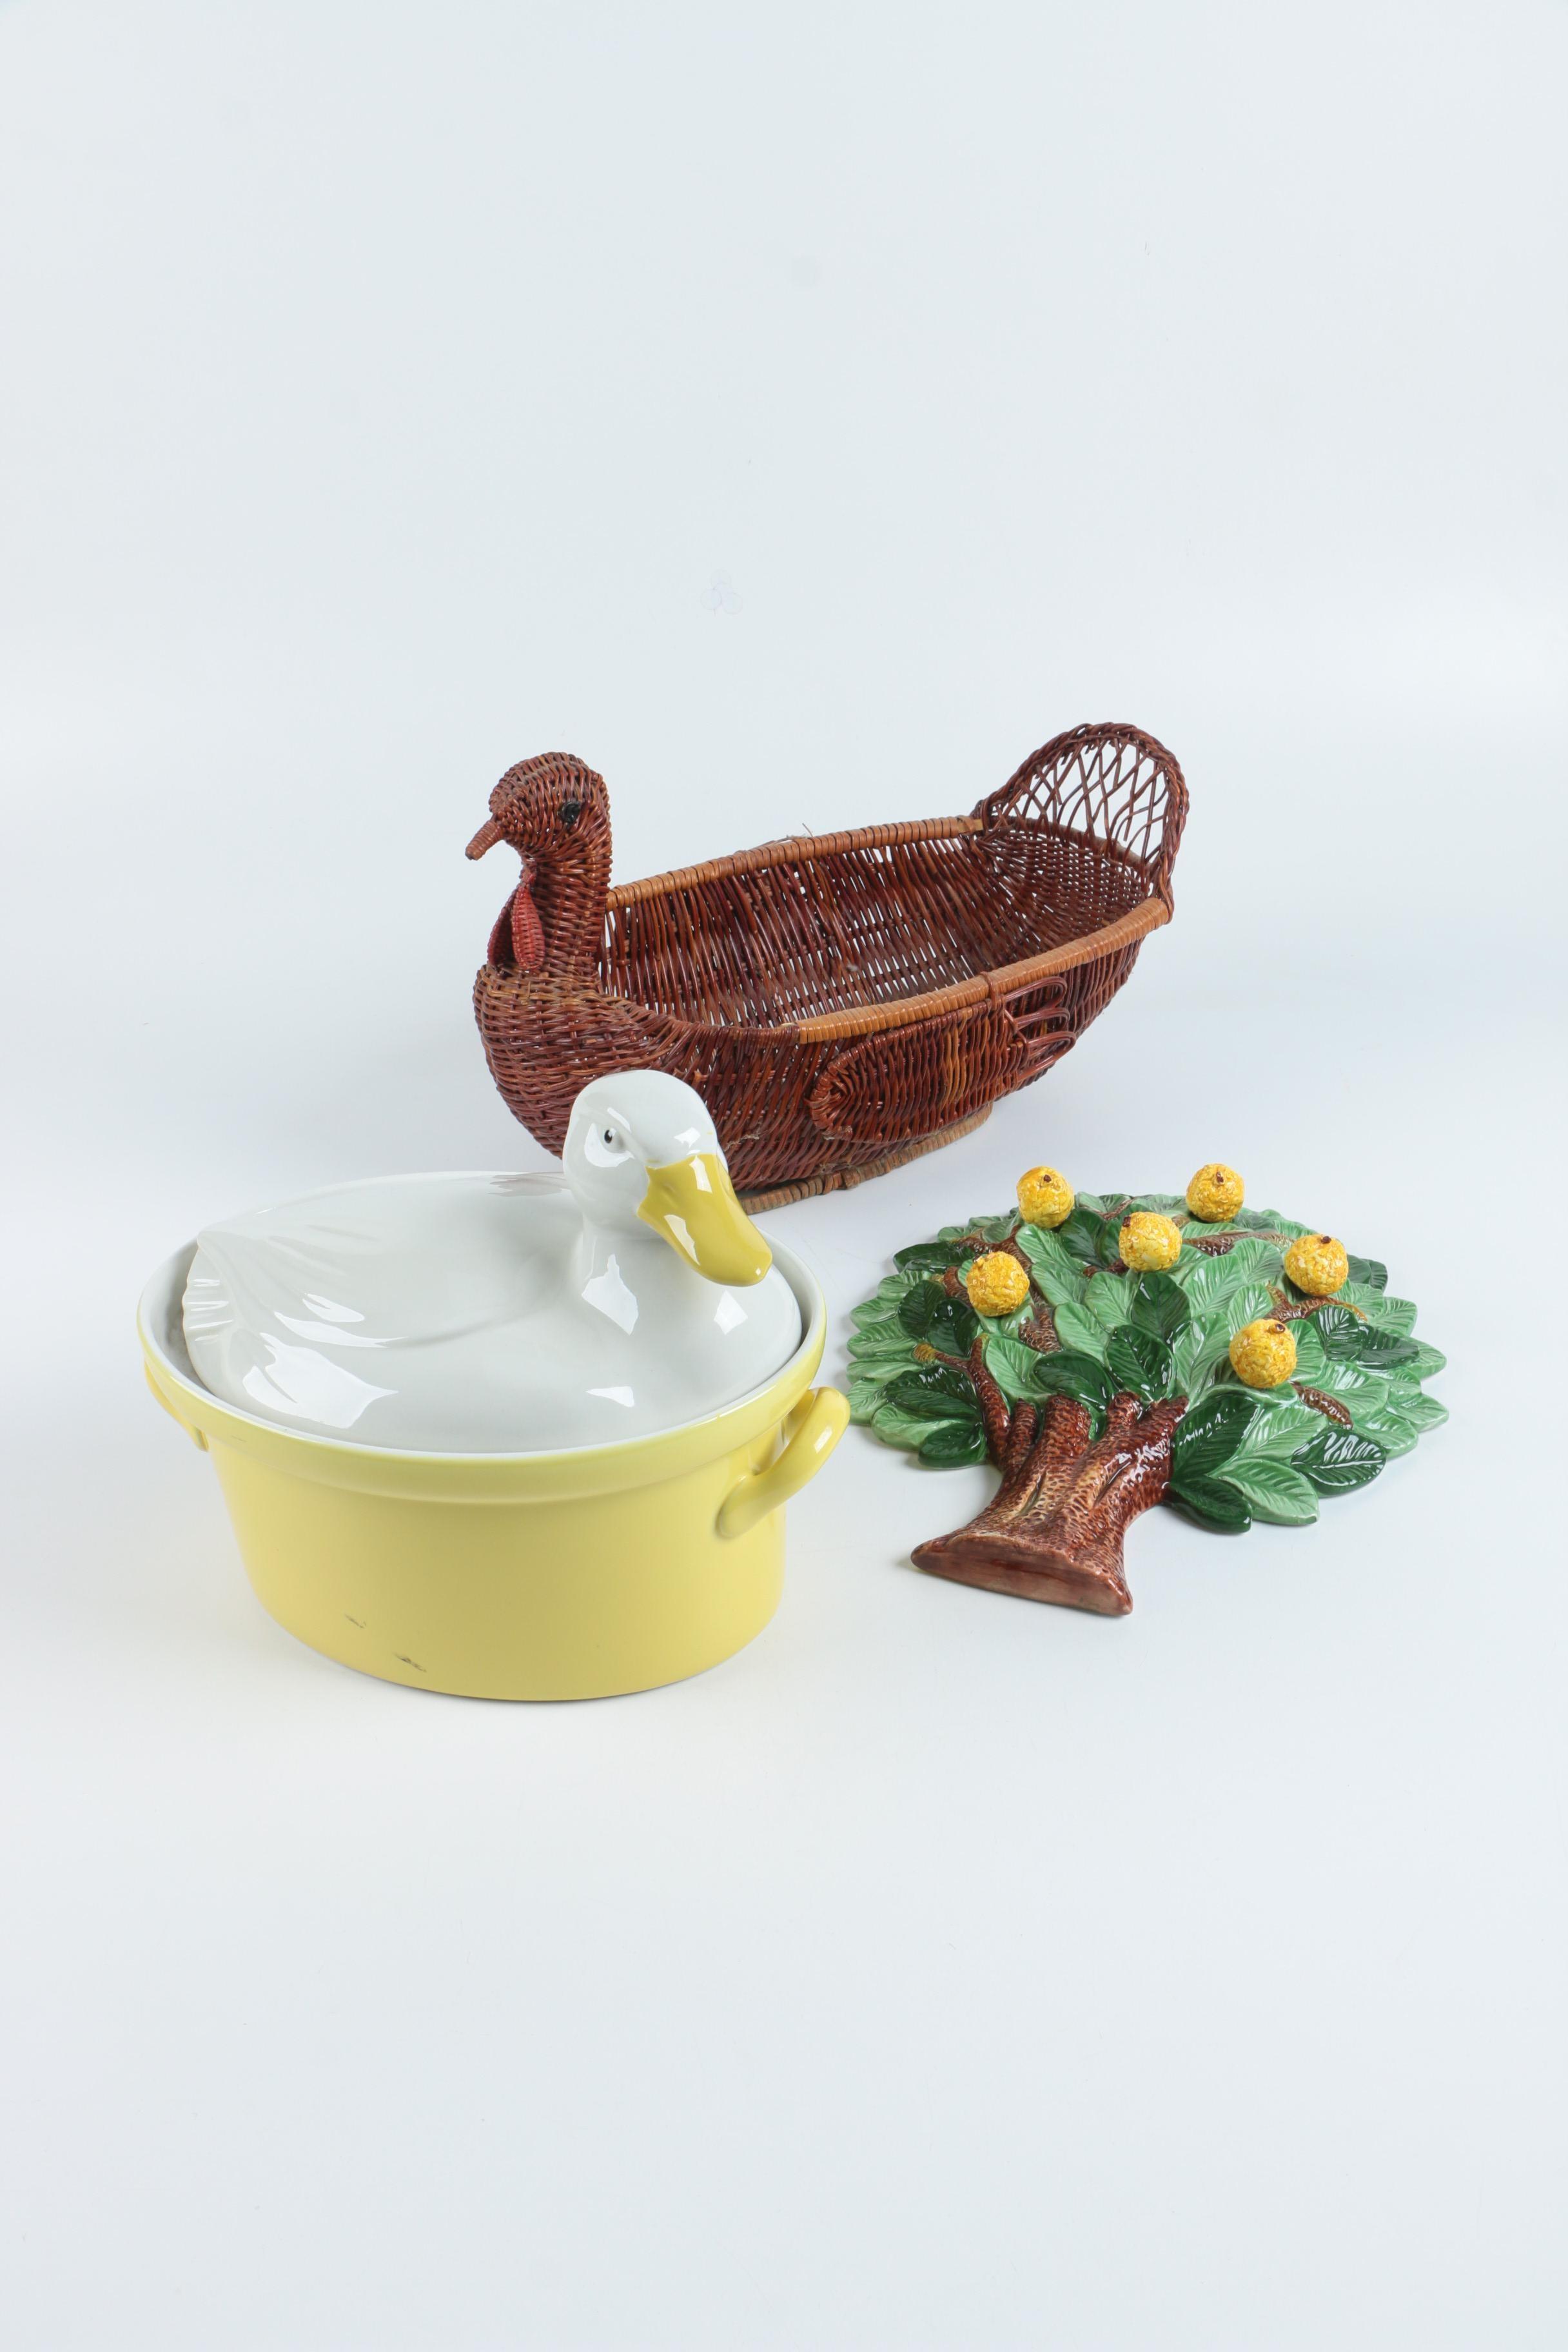 Duck Tureen, Turkey Basket, and Italian Ceramic Wall Decor